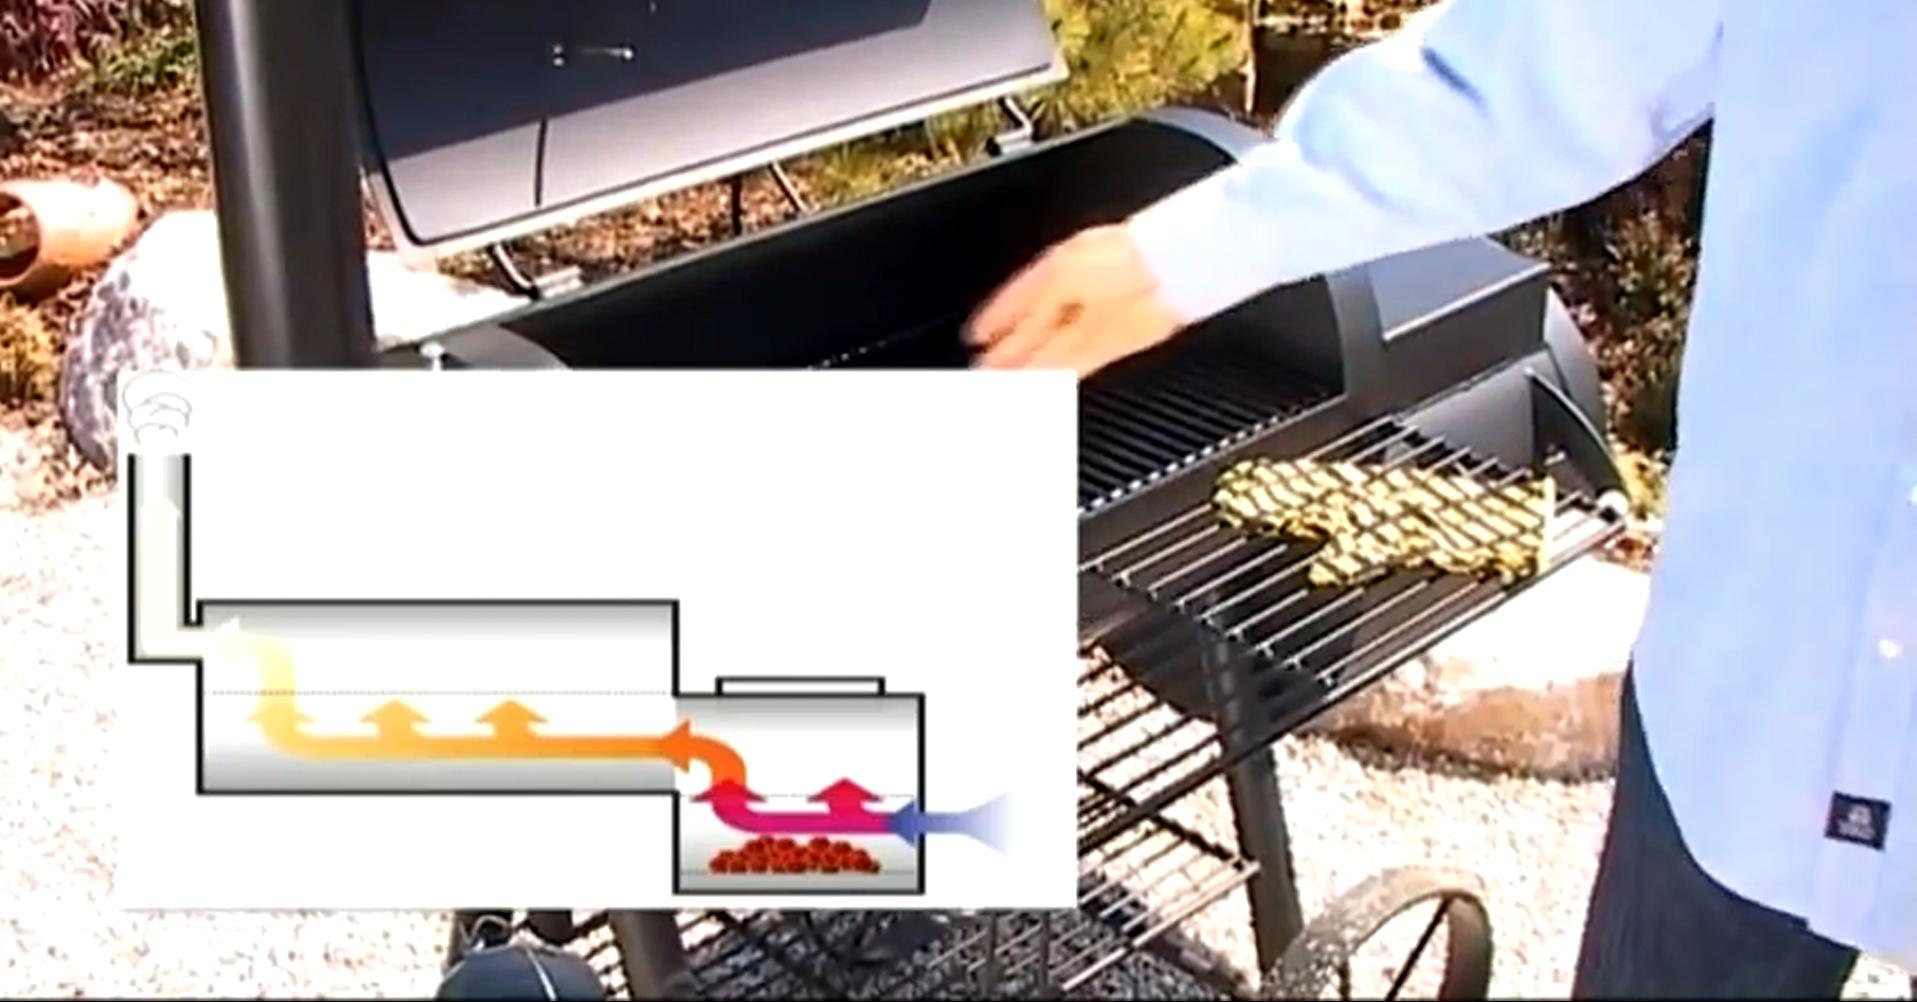 Landmann Holzkohlegrill Grill Lok 11093 : Smoker grill kaufen bbq grill smoker